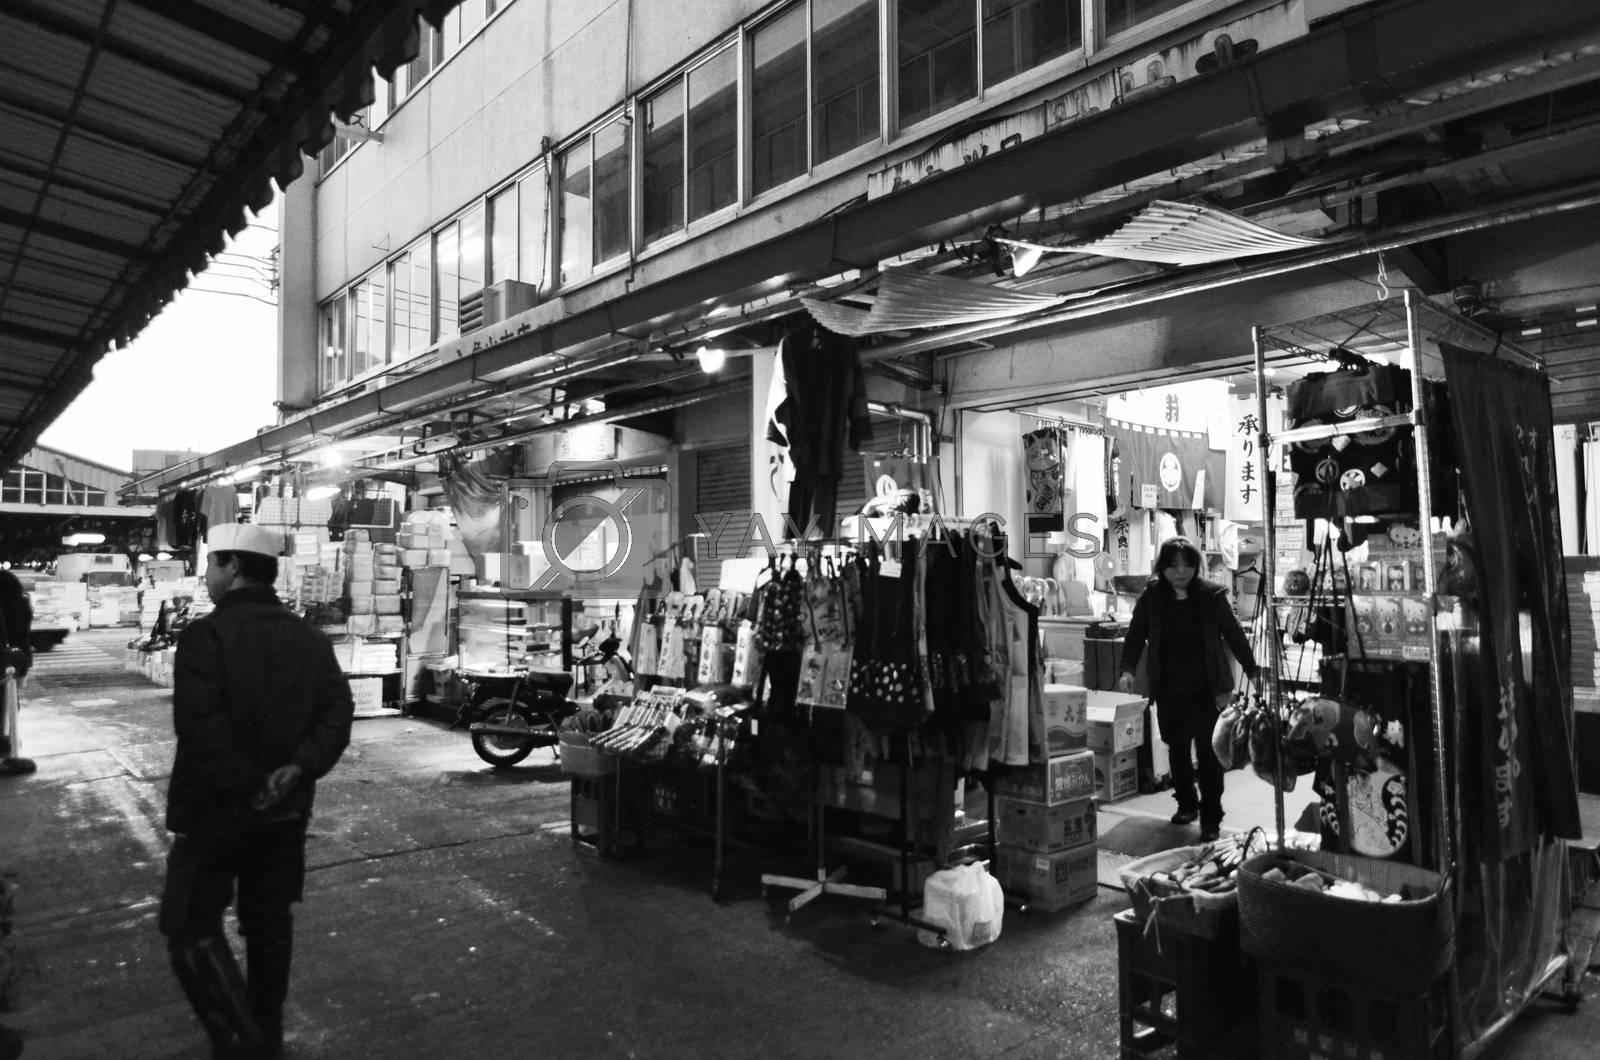 TOKYO, JAPAN- NOV 26, 2013: Tsukiji market is a large market for fish in central Tokyo. The market consists of small shops and restaurants crowded along narrow lanes. Tokyo, Japan. November 26 2013